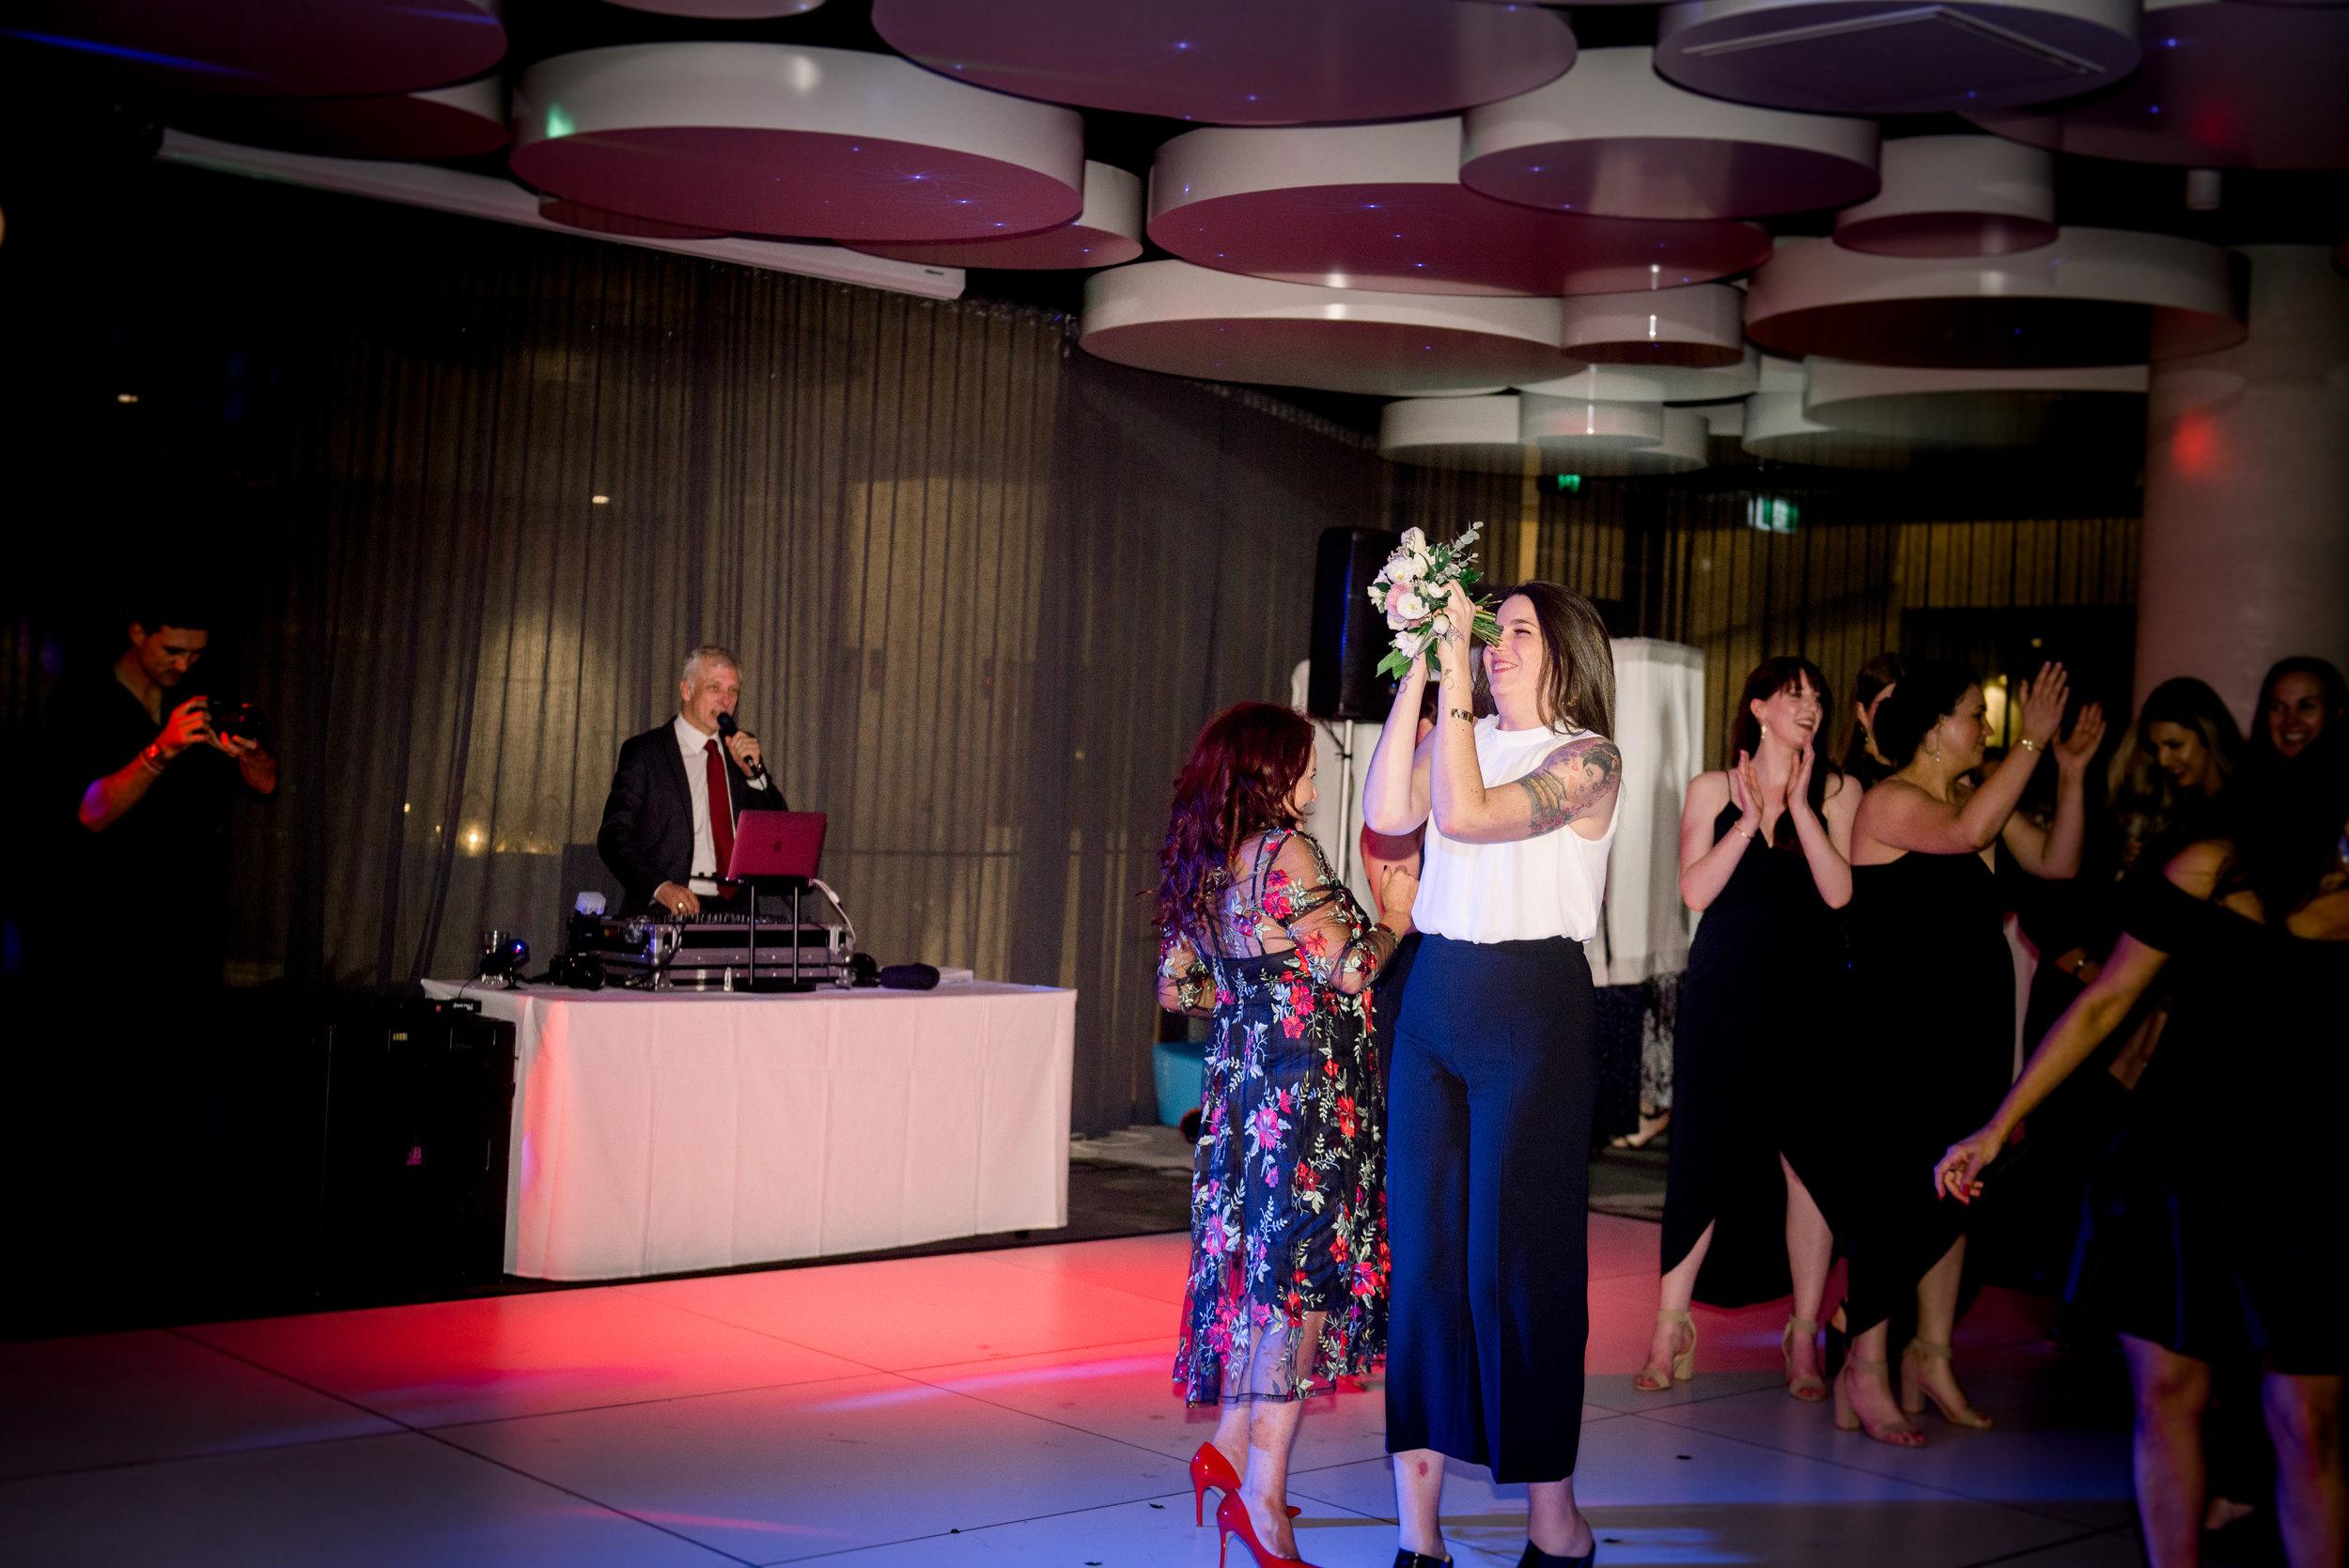 brisbane-city-wedding-photographer-romantic-wedding-138.jpg